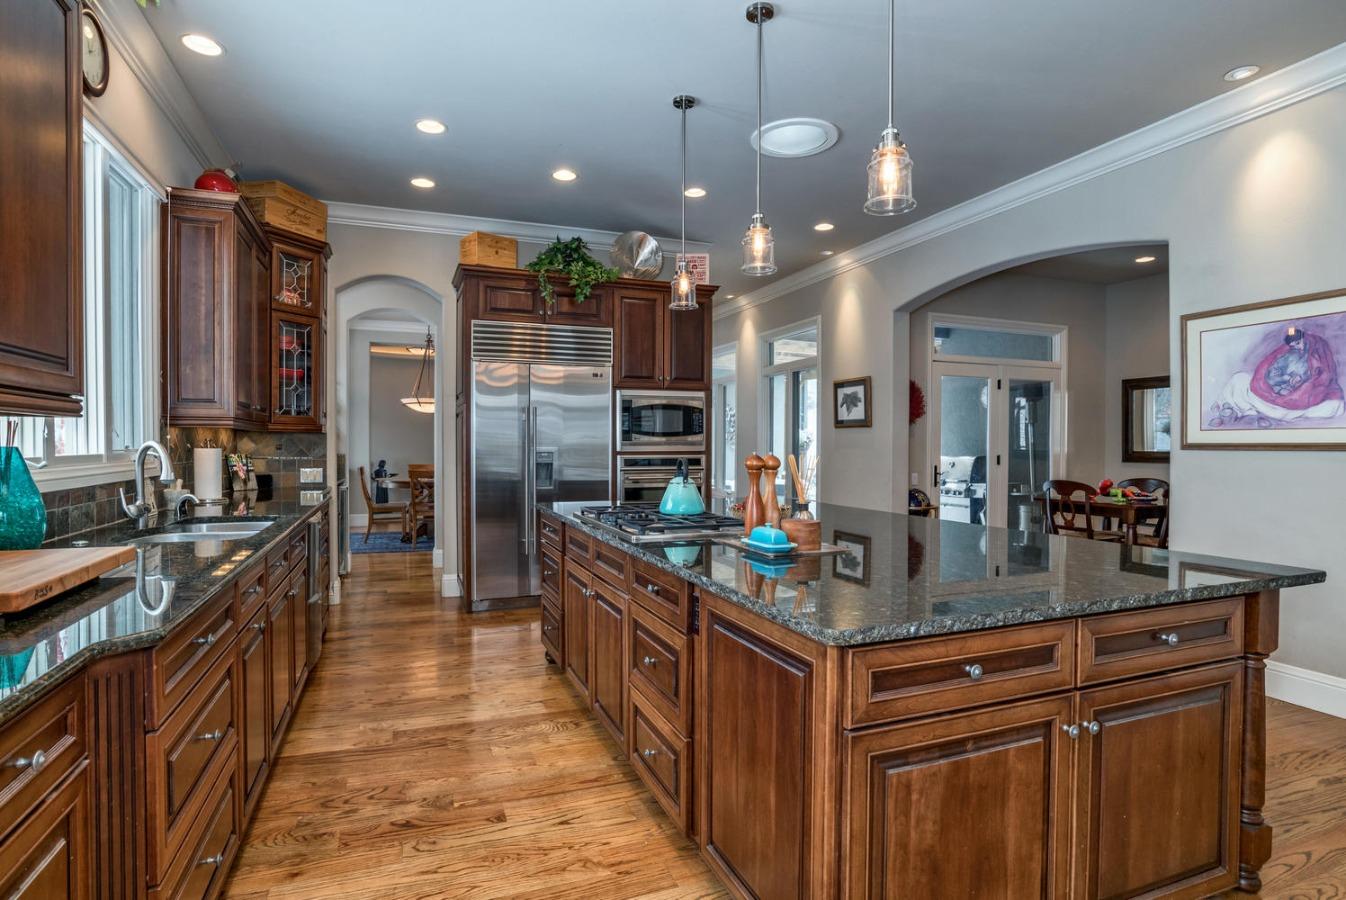 Slab Granite Kitchen Island Measures 9 x 5